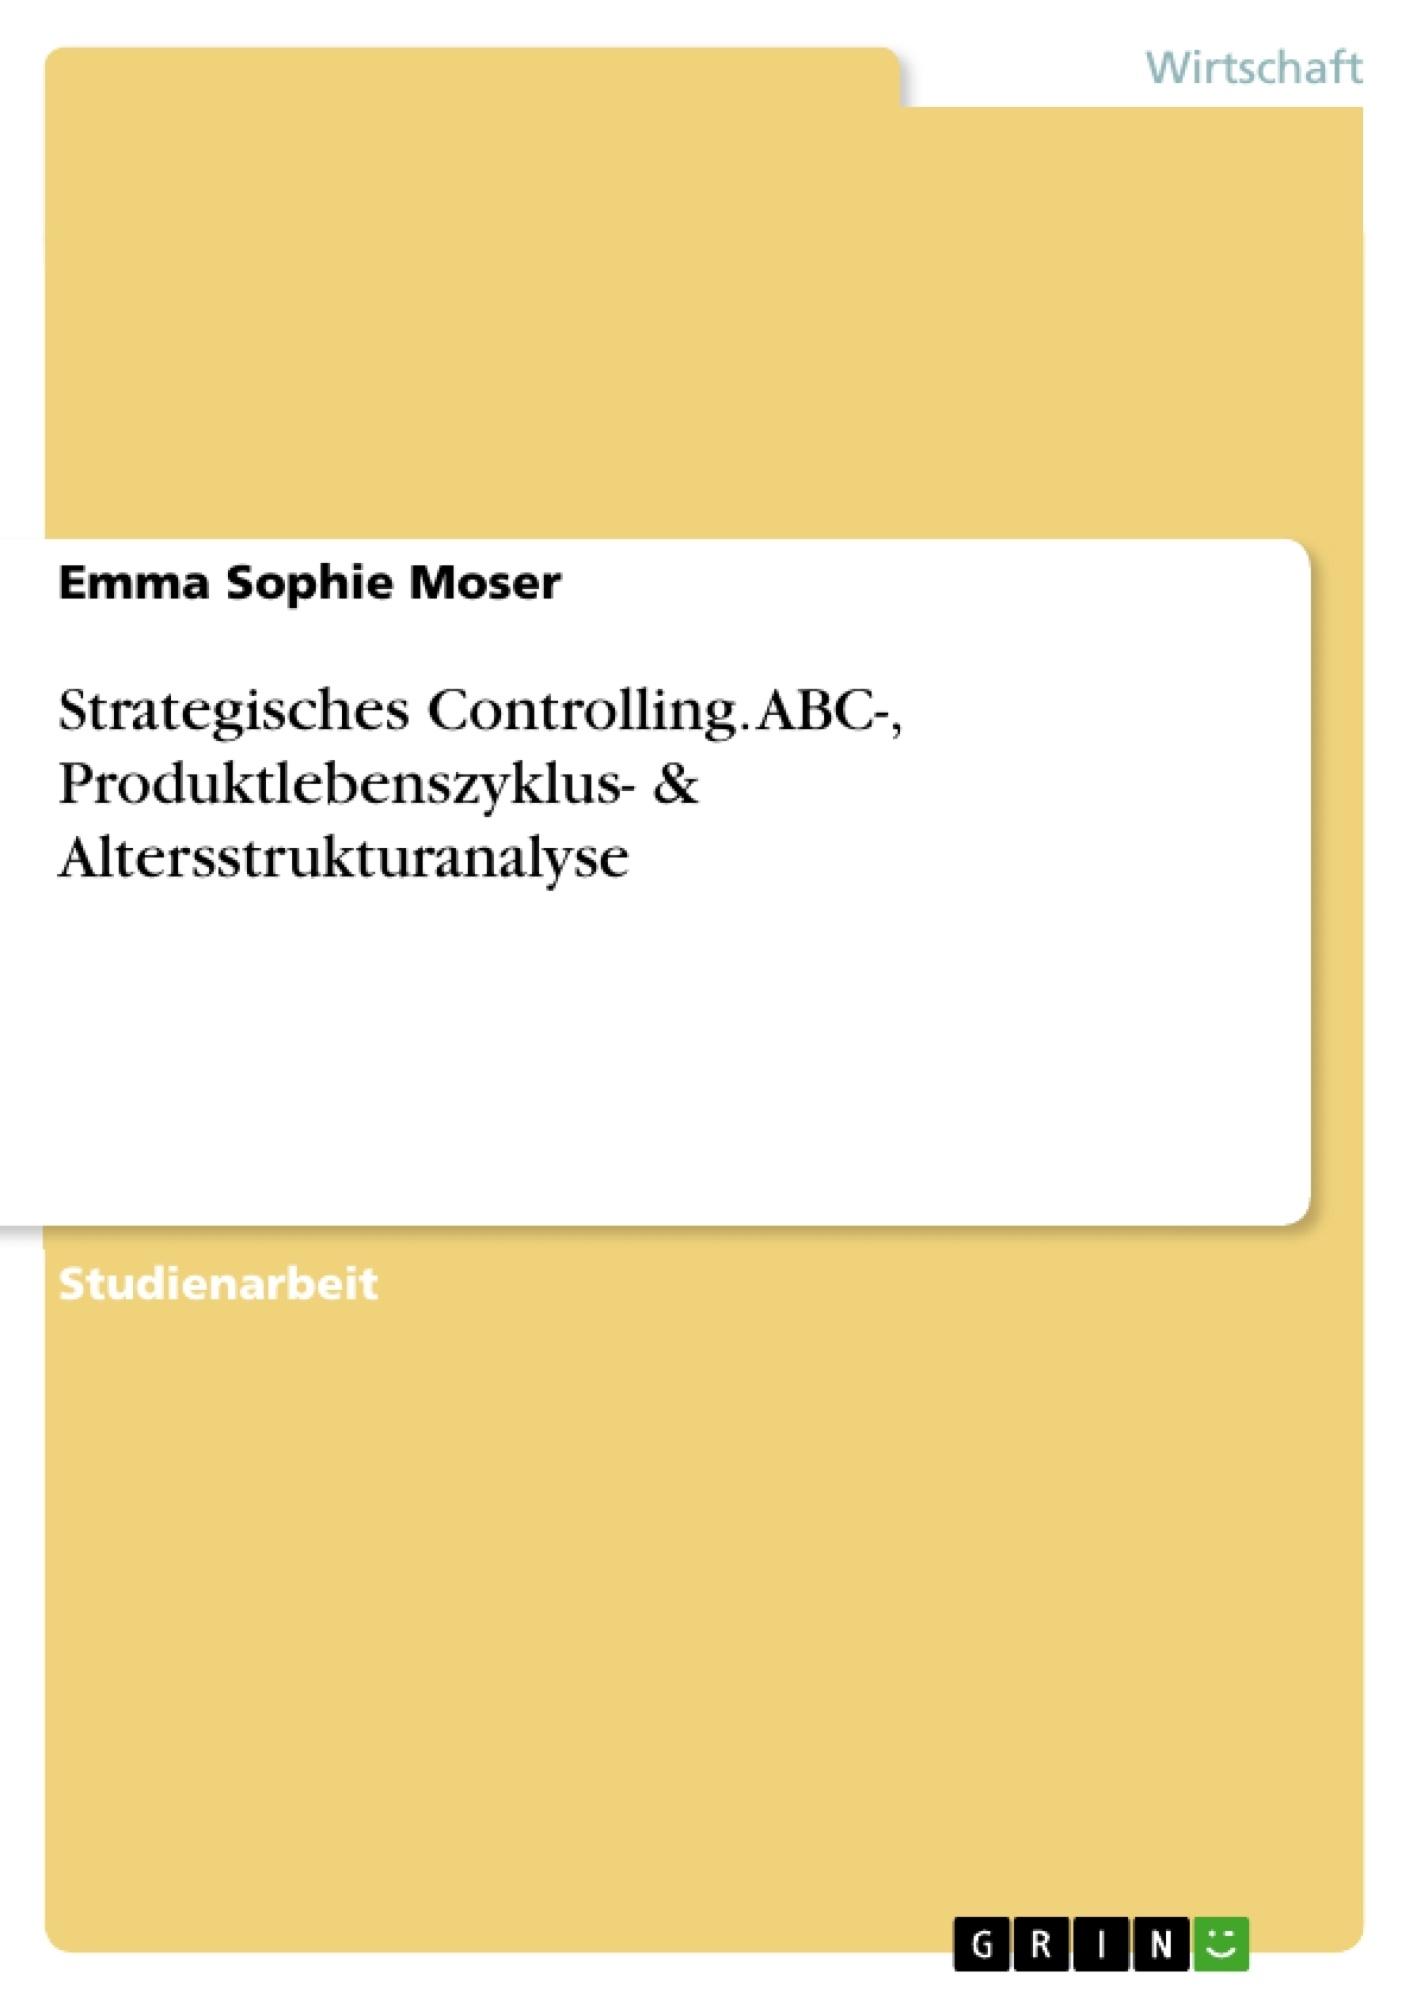 Titel: Strategisches Controlling. ABC-, Produktlebenszyklus- & Altersstrukturanalyse